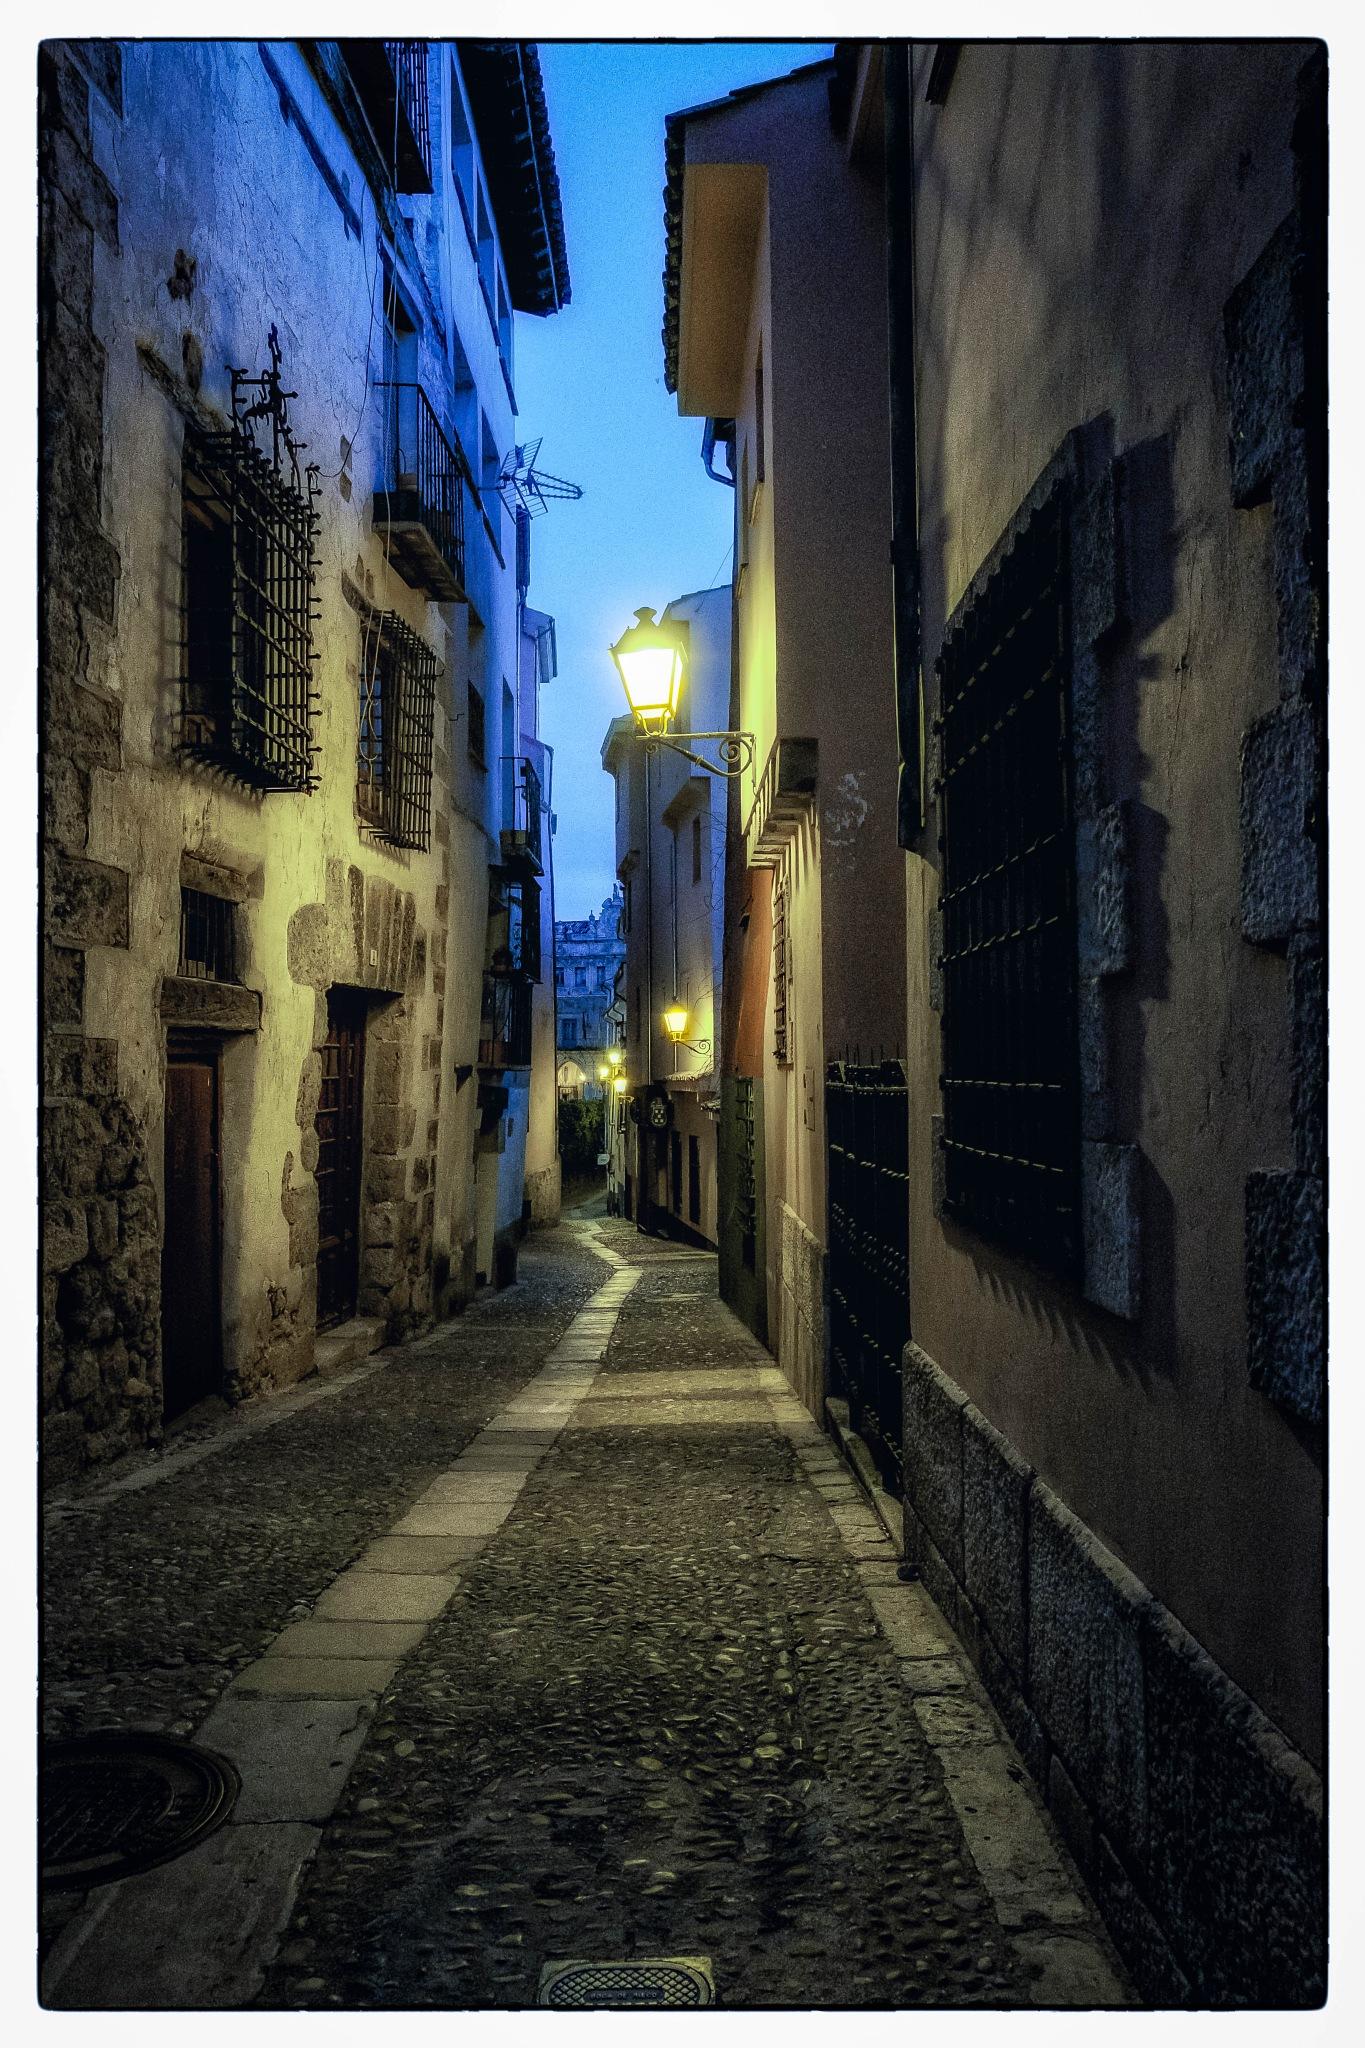 Old street at night by Jose Luis Quijada